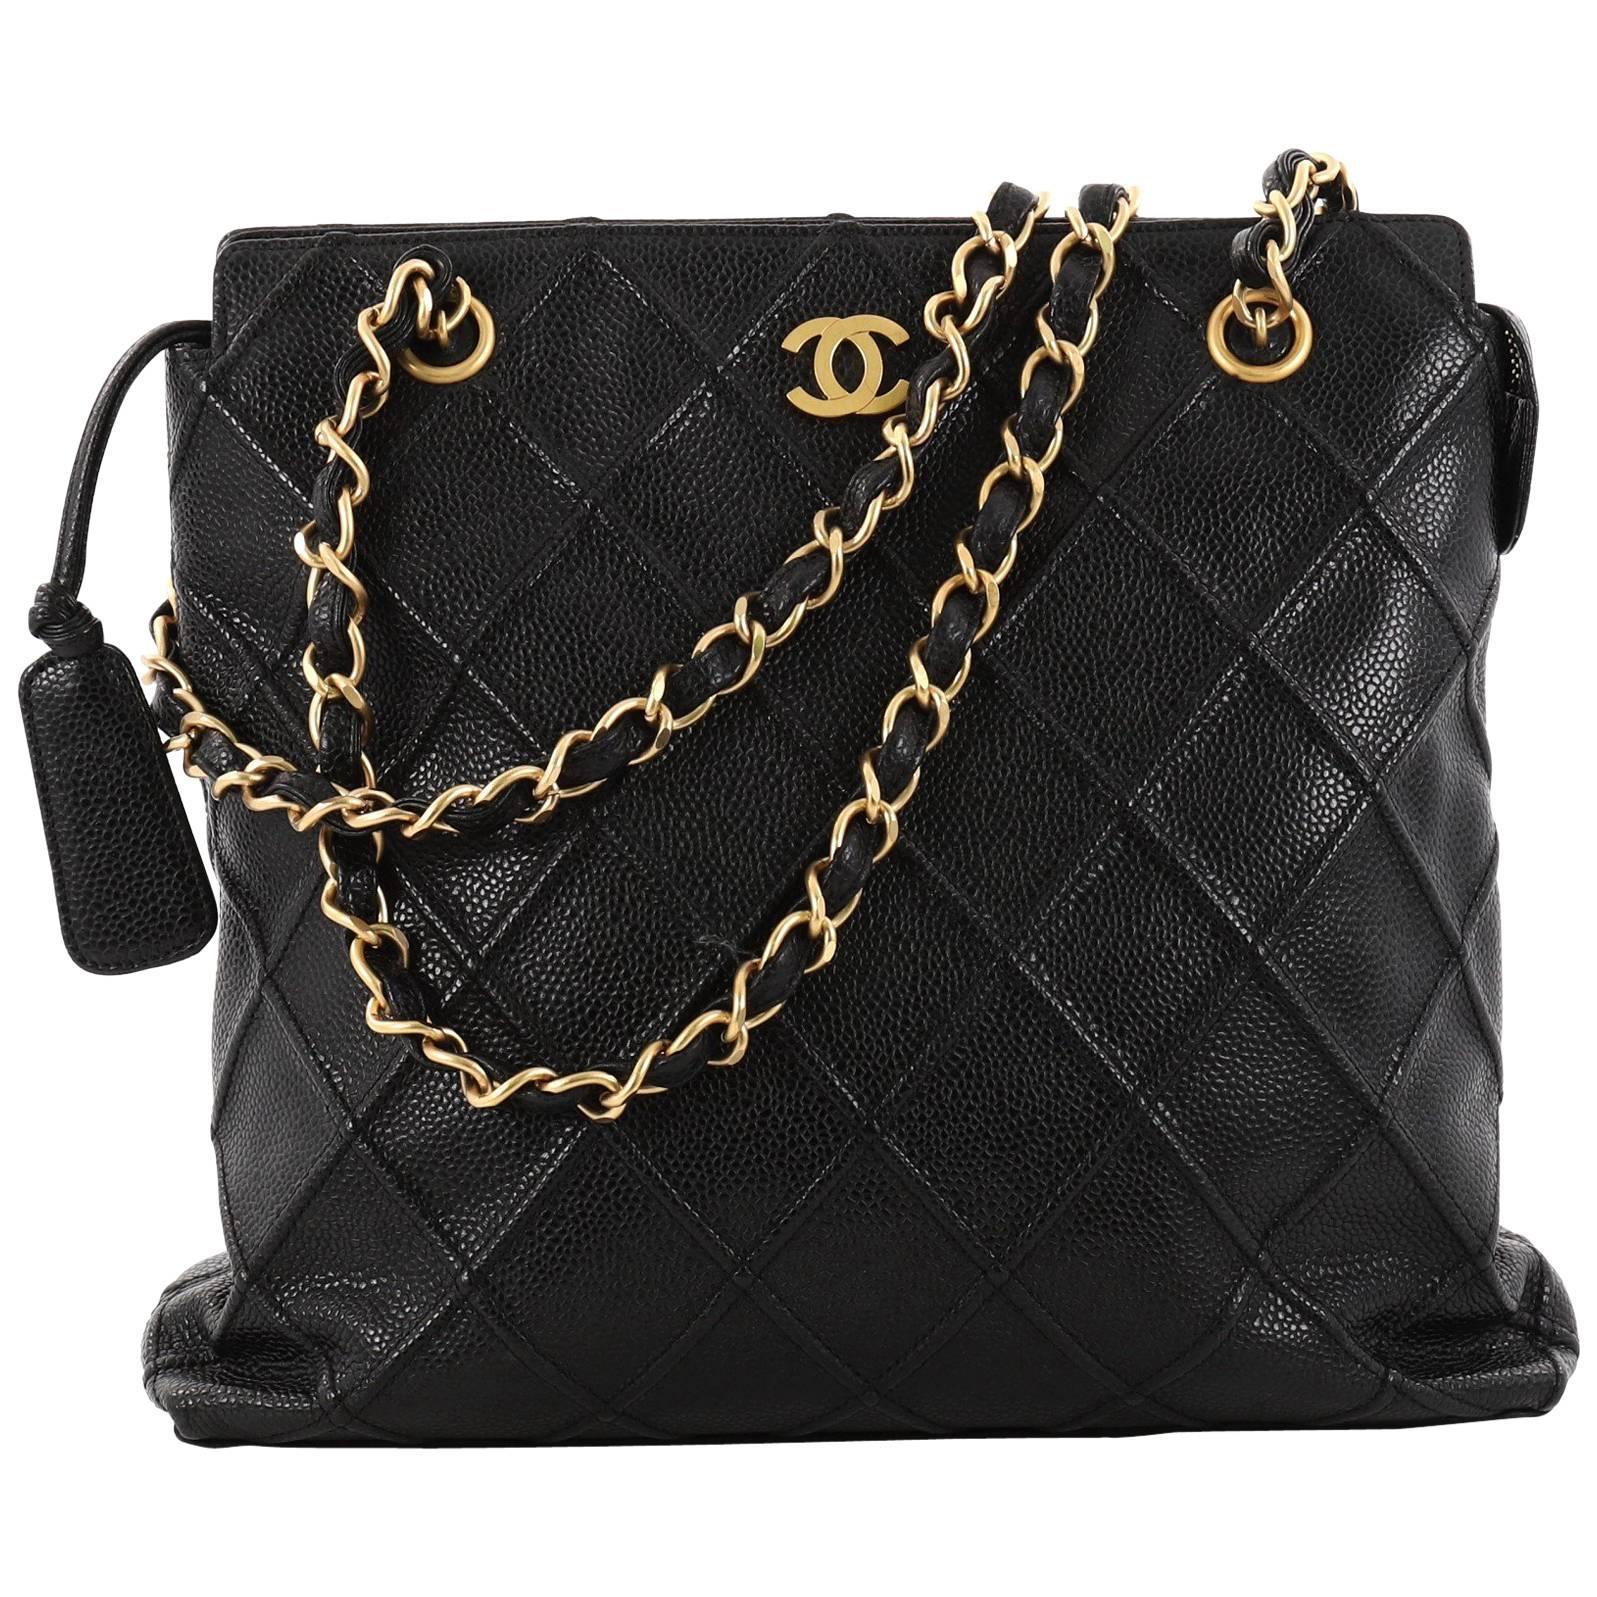 1stdibs Vintage Chanel Black Chevron Quilted Chain Handbag LZ02cQ8